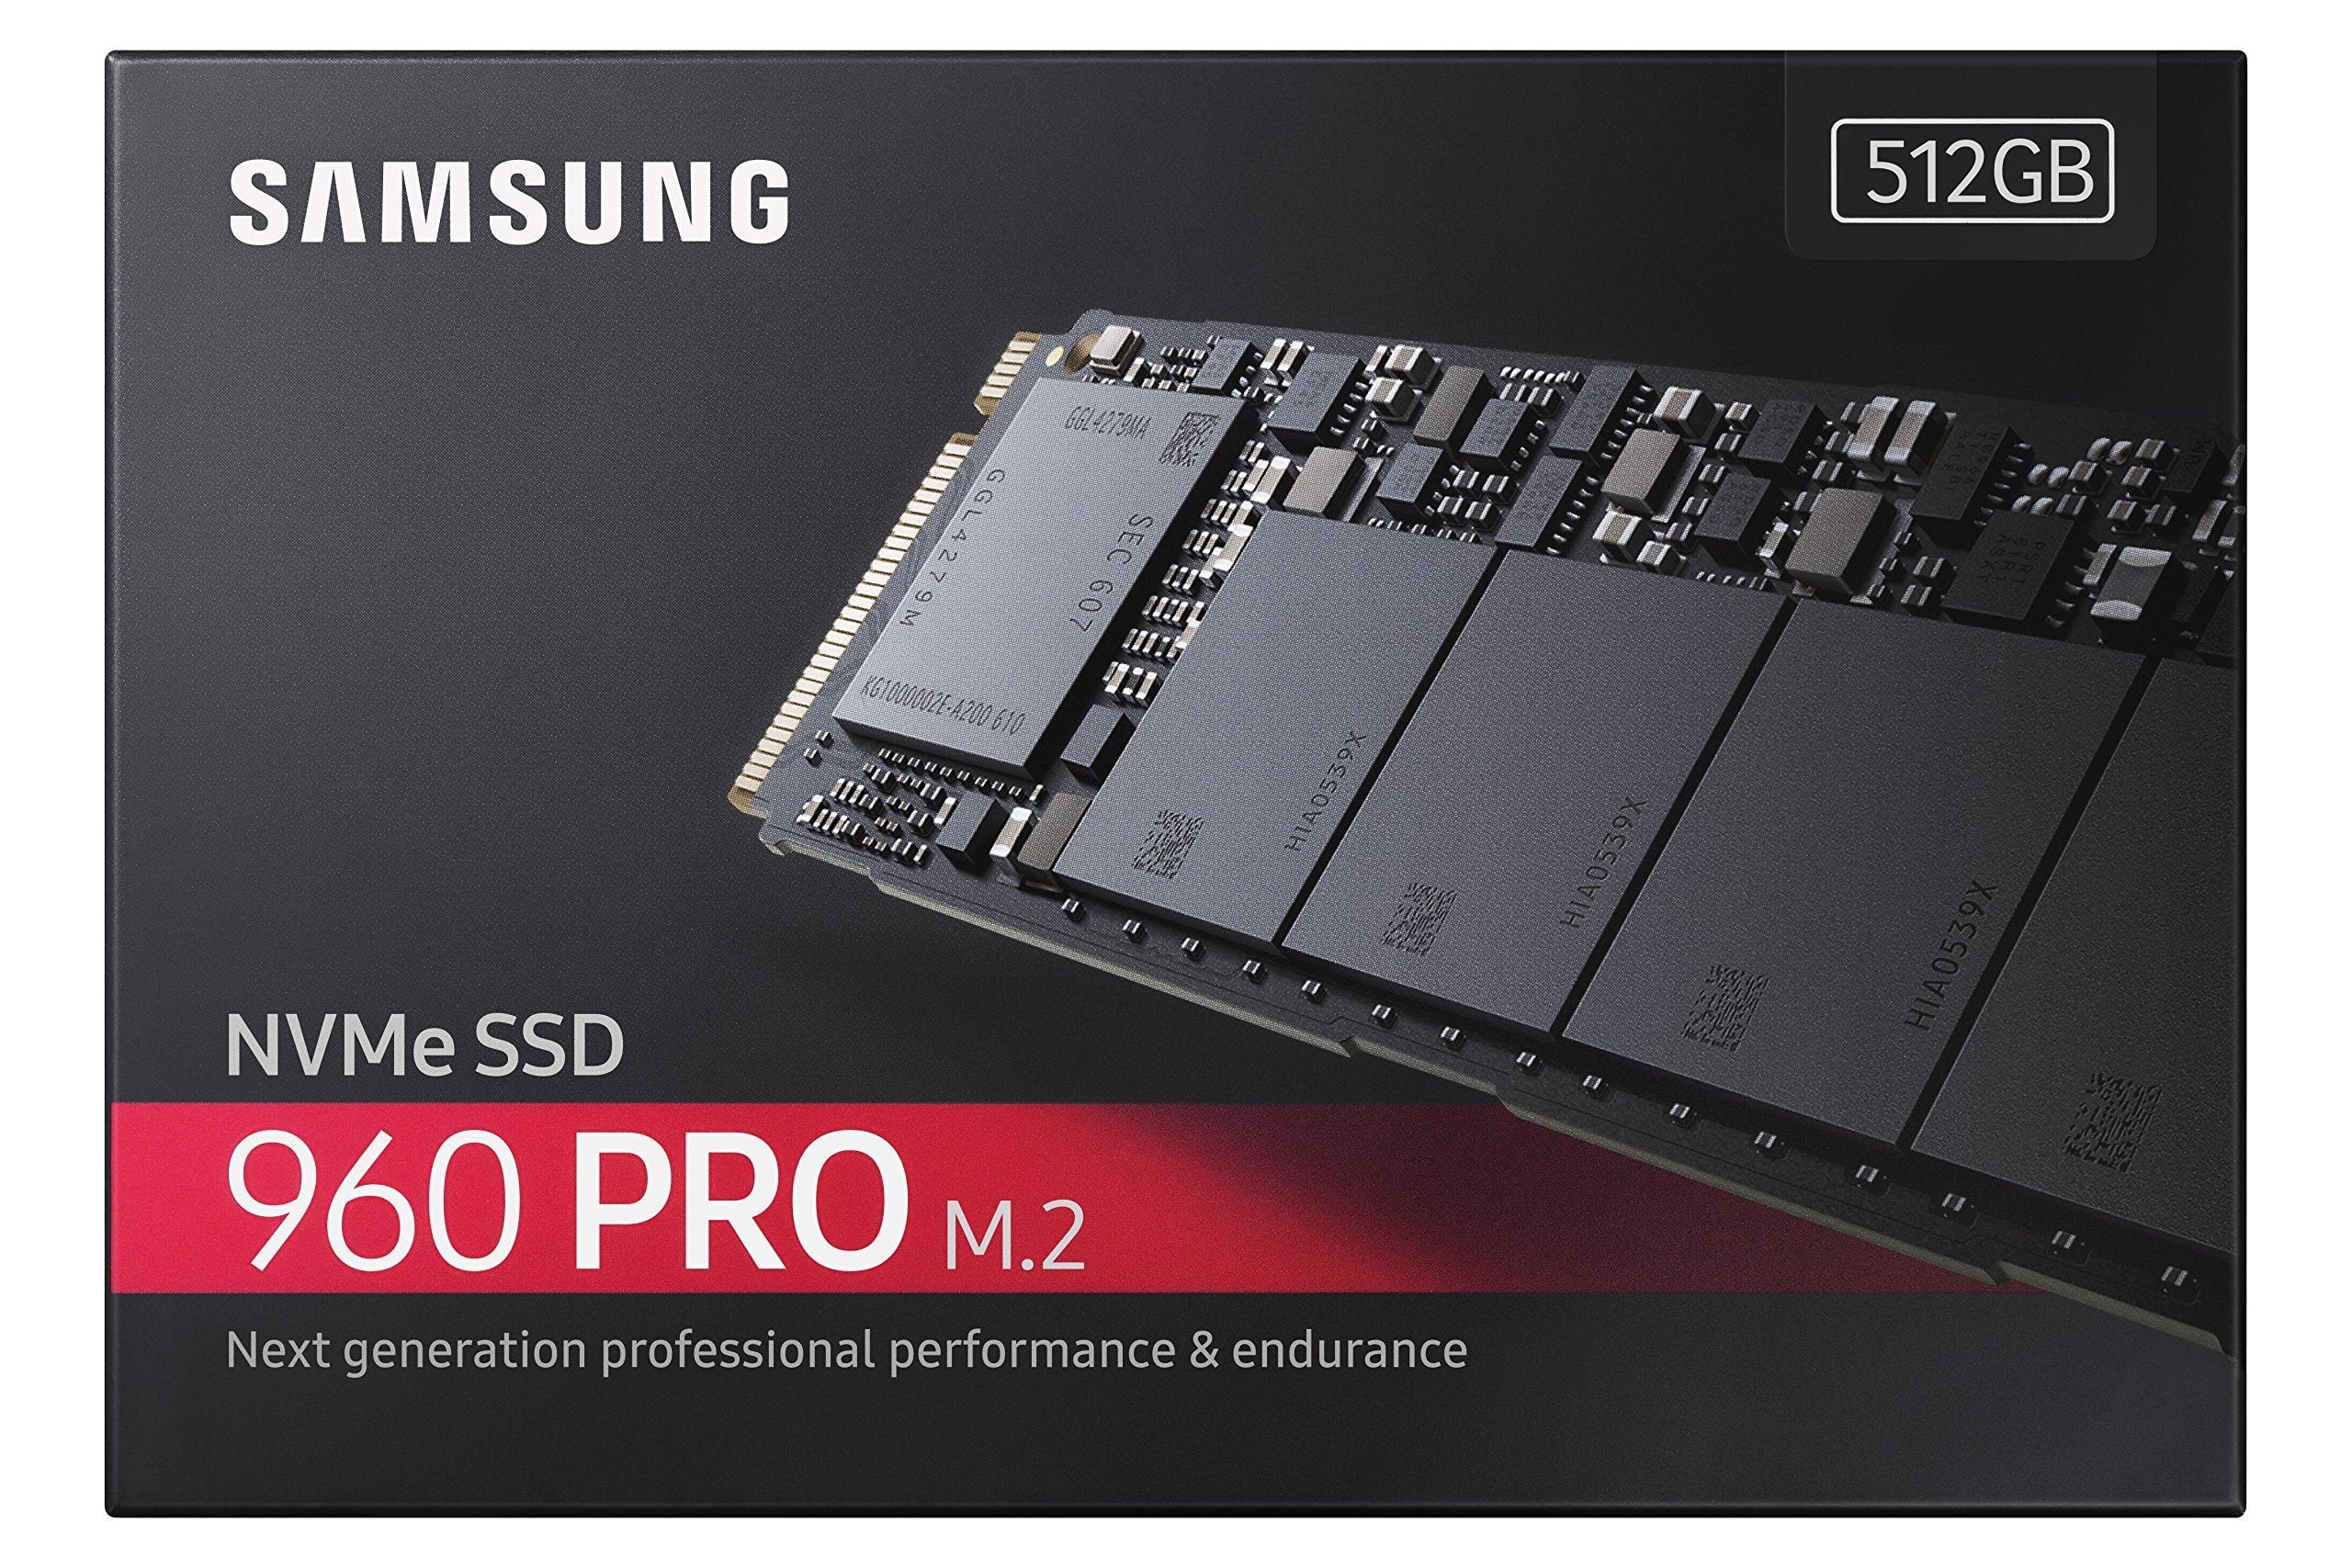 Samsung 960 PRO Series - 512GB PCIe NVMe - M.2 Internal SSD (MZ-V6P512BW) by Samsung (Image #5)